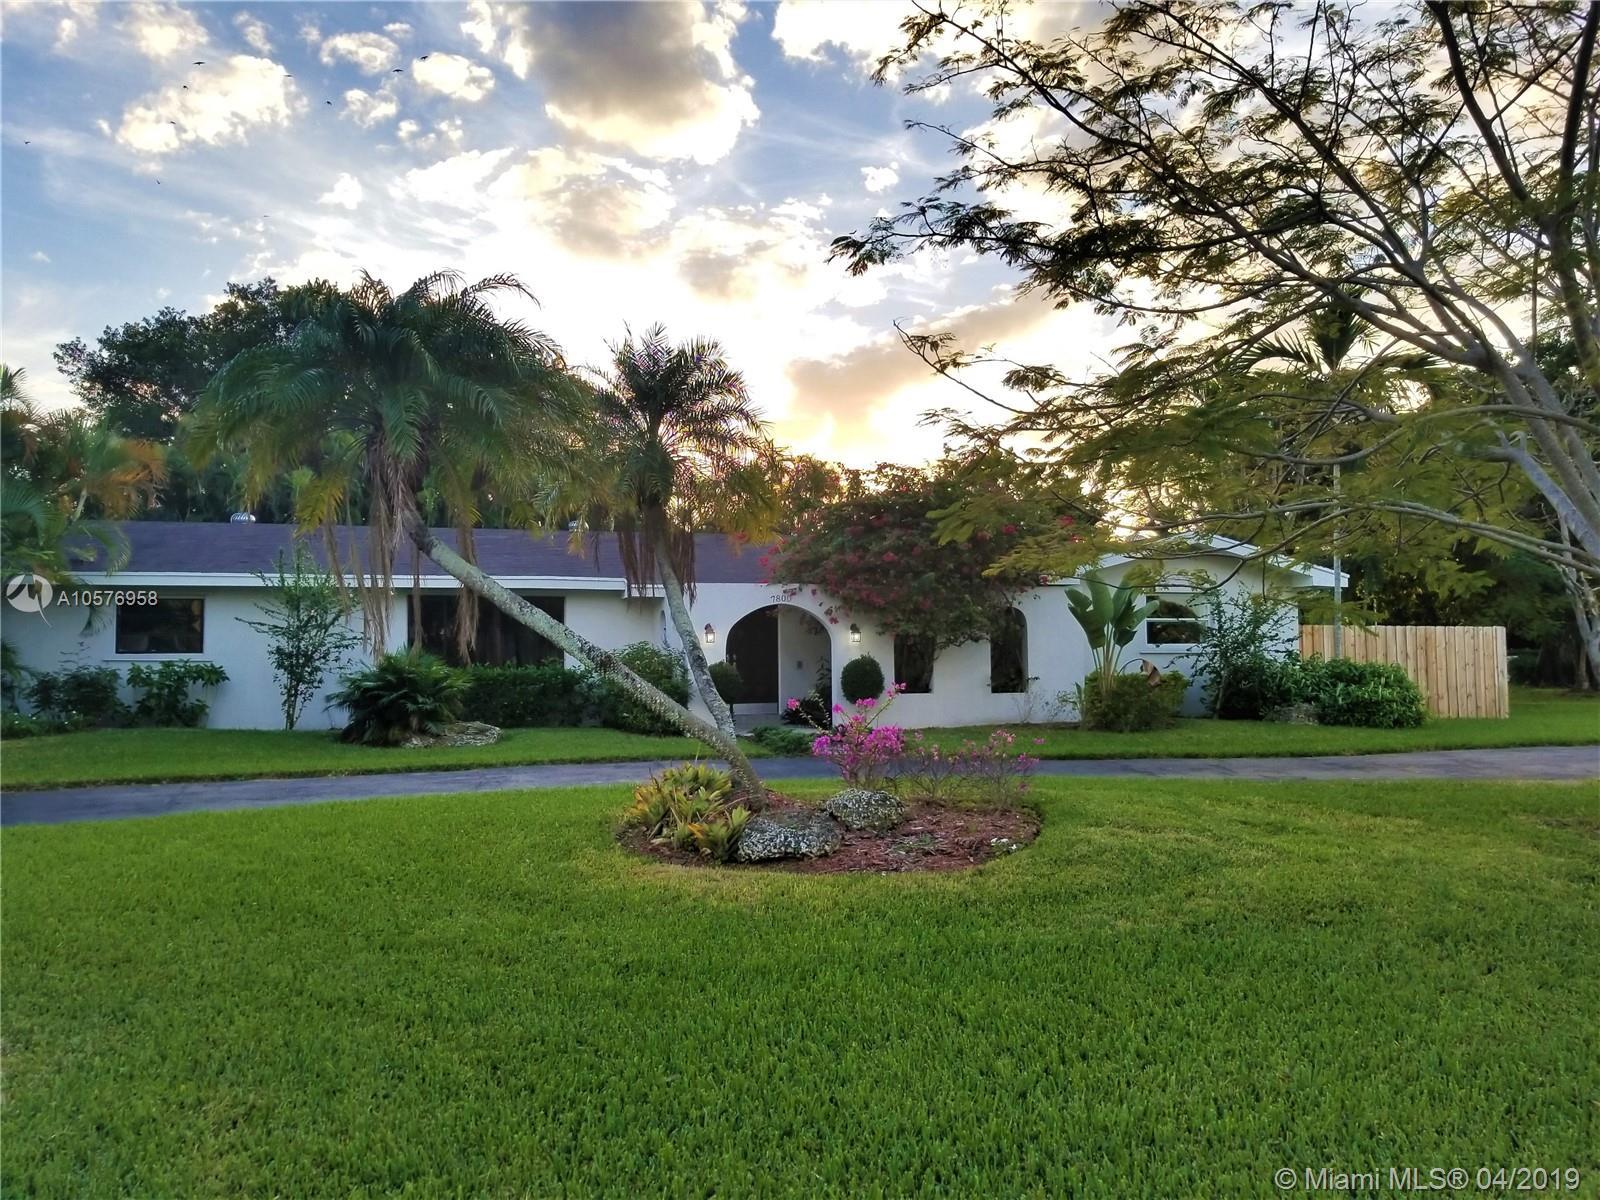 Palmetto Bay-Miami Homes for Sale -  Price Reduced,  7800 SW 164th St